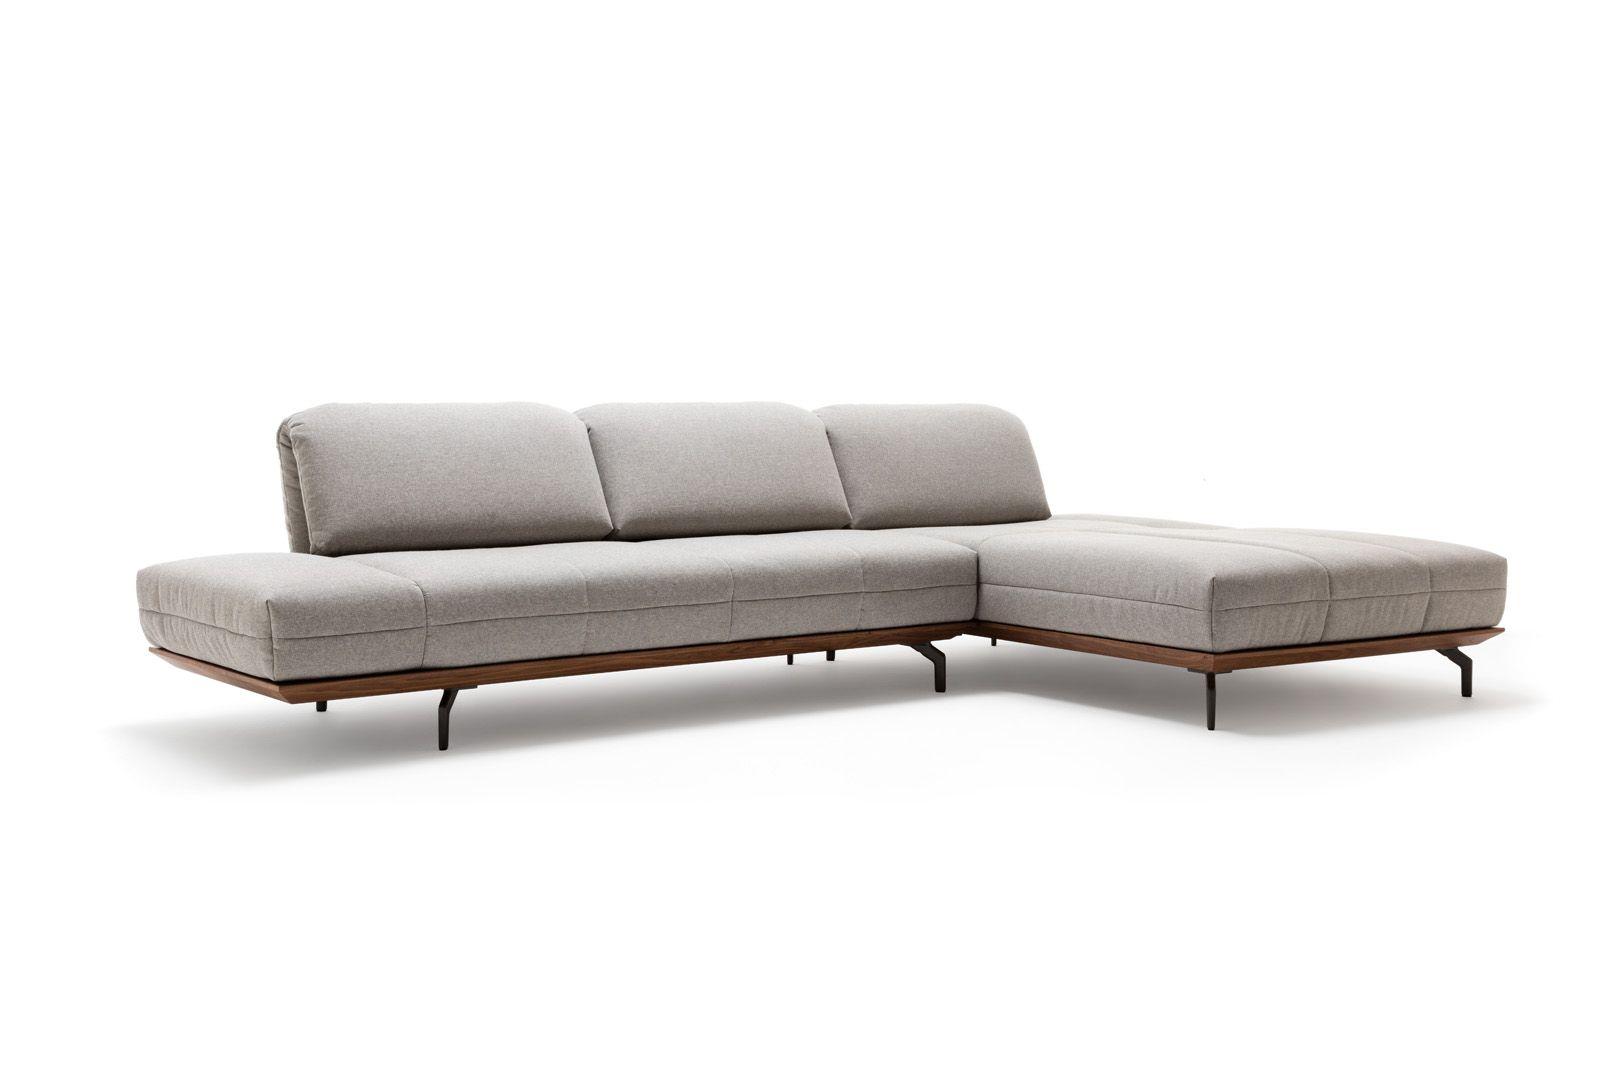 h lsta sofa sofa mit r ckenfunktion rampe in. Black Bedroom Furniture Sets. Home Design Ideas